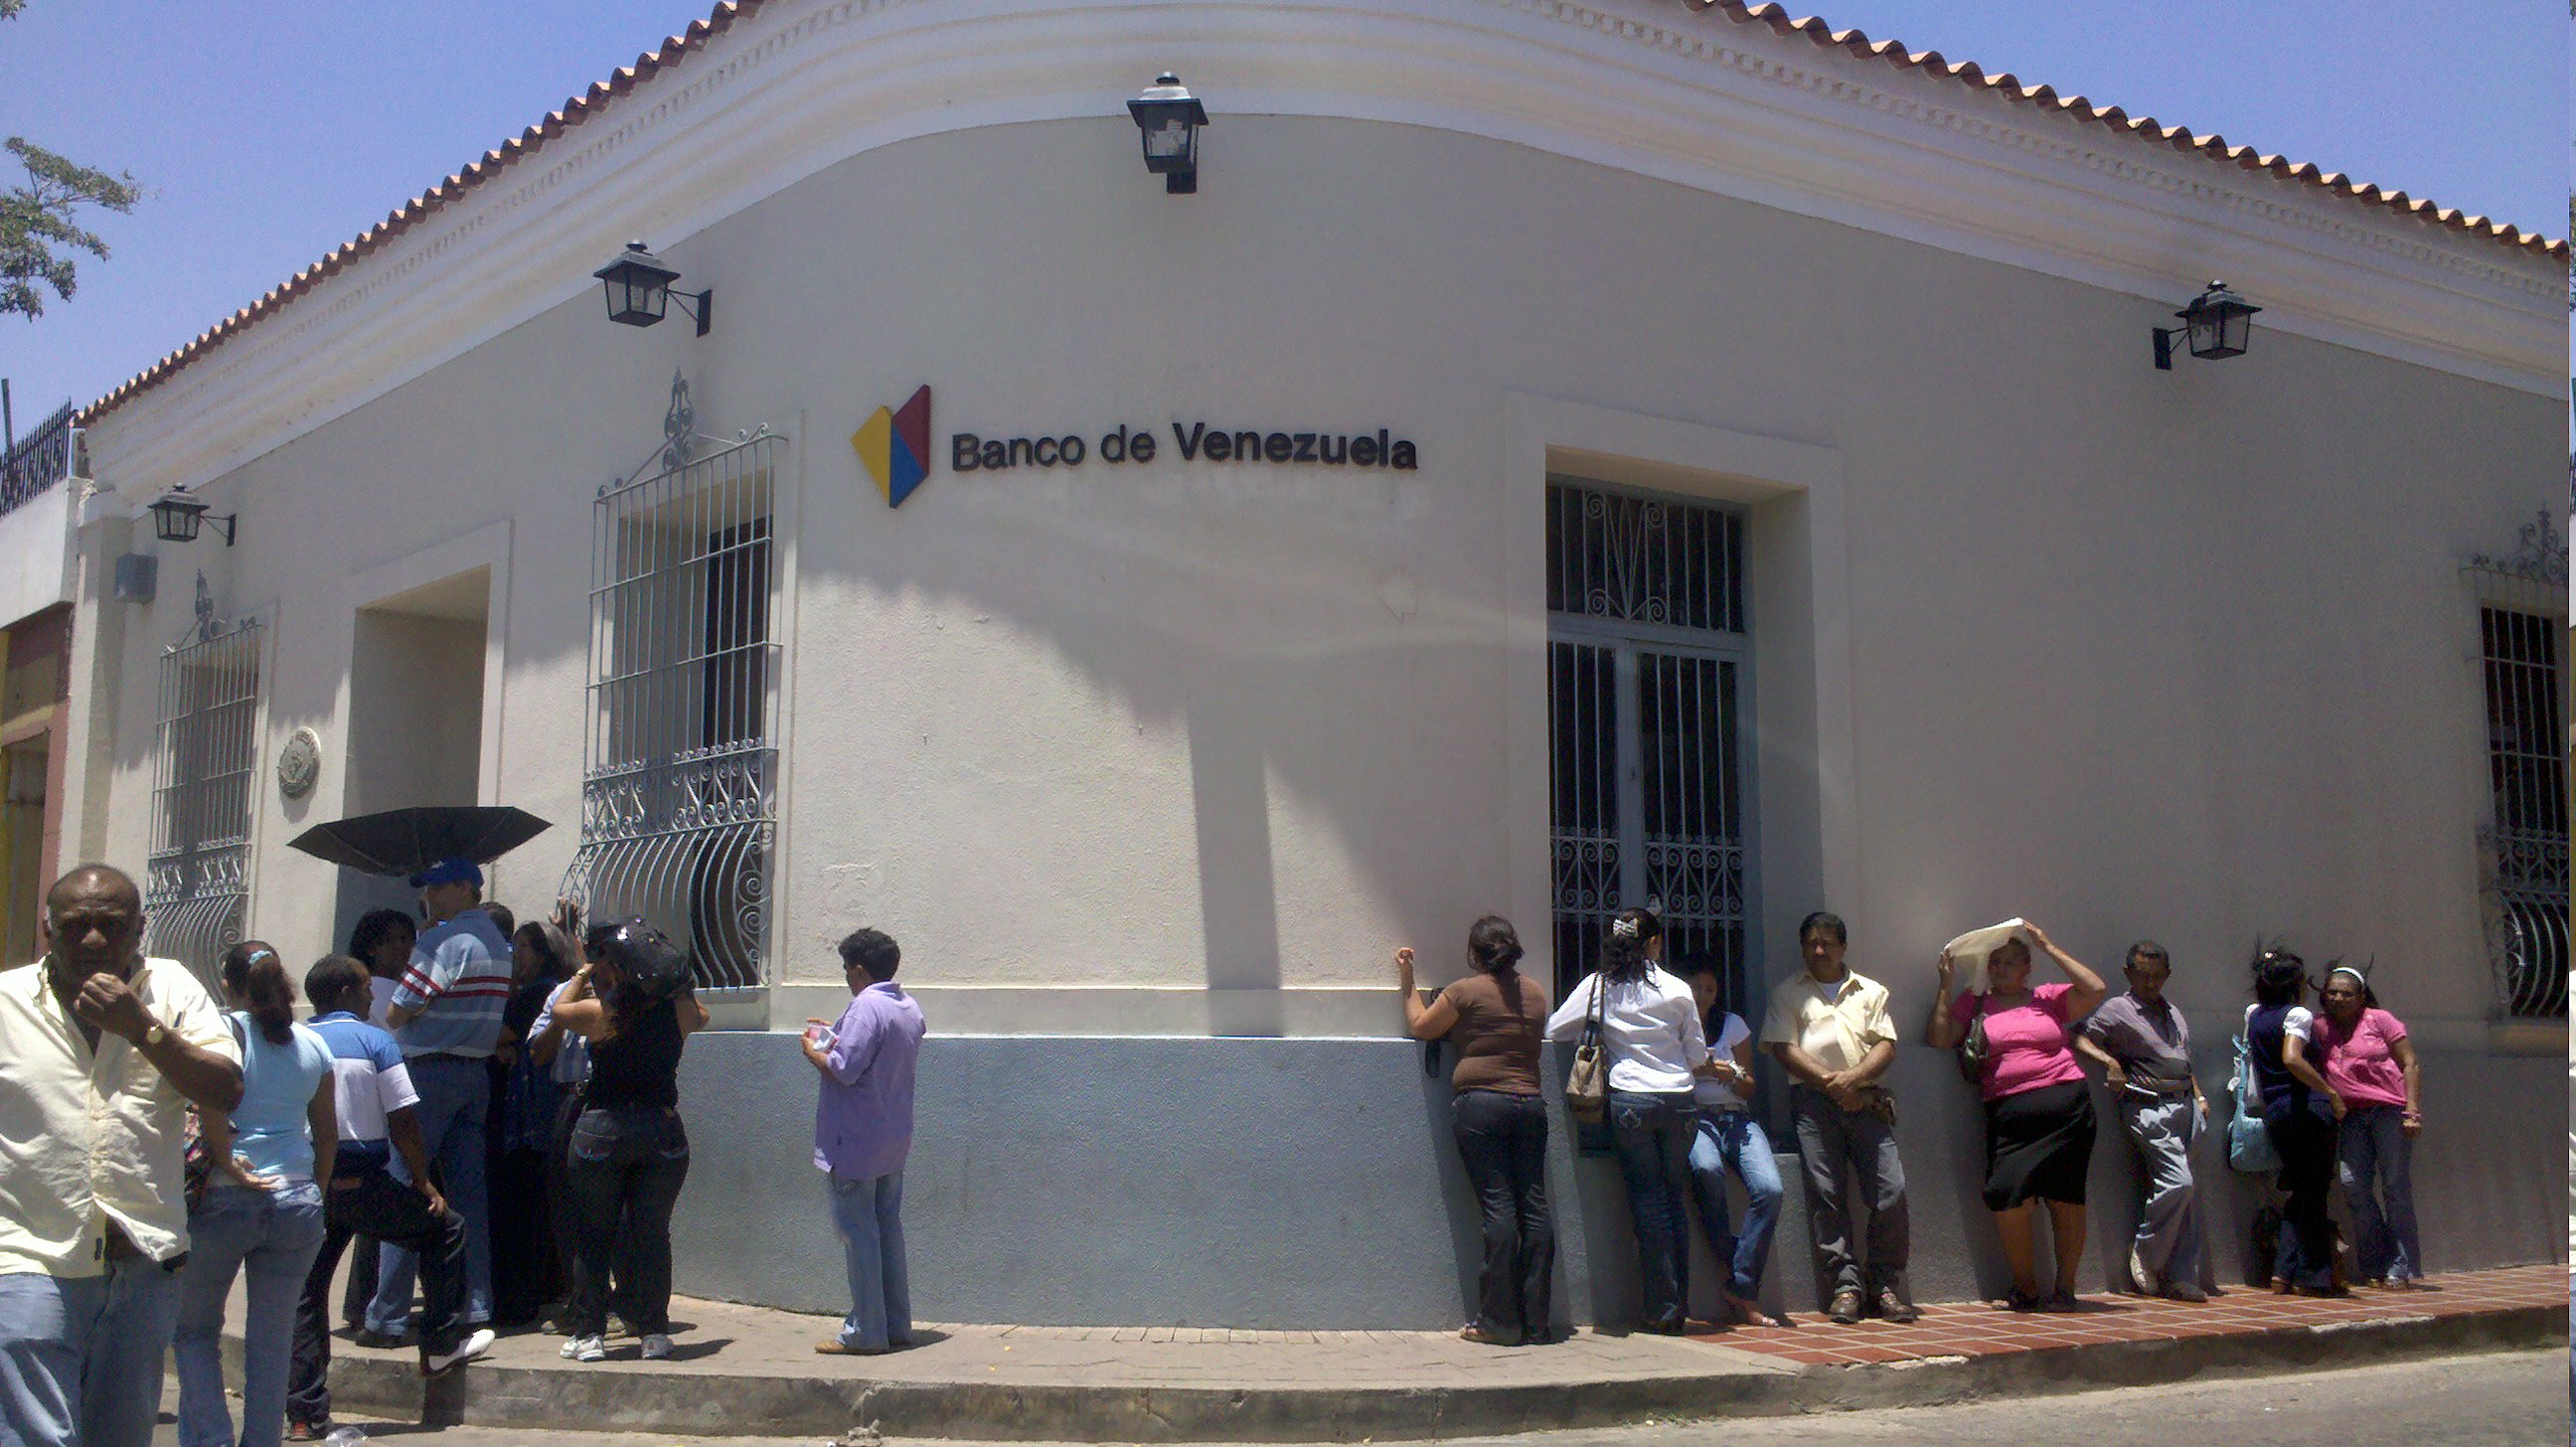 Archivo banco de venezuela coro jpg wikipedia la for Banco exterior empleo caracas